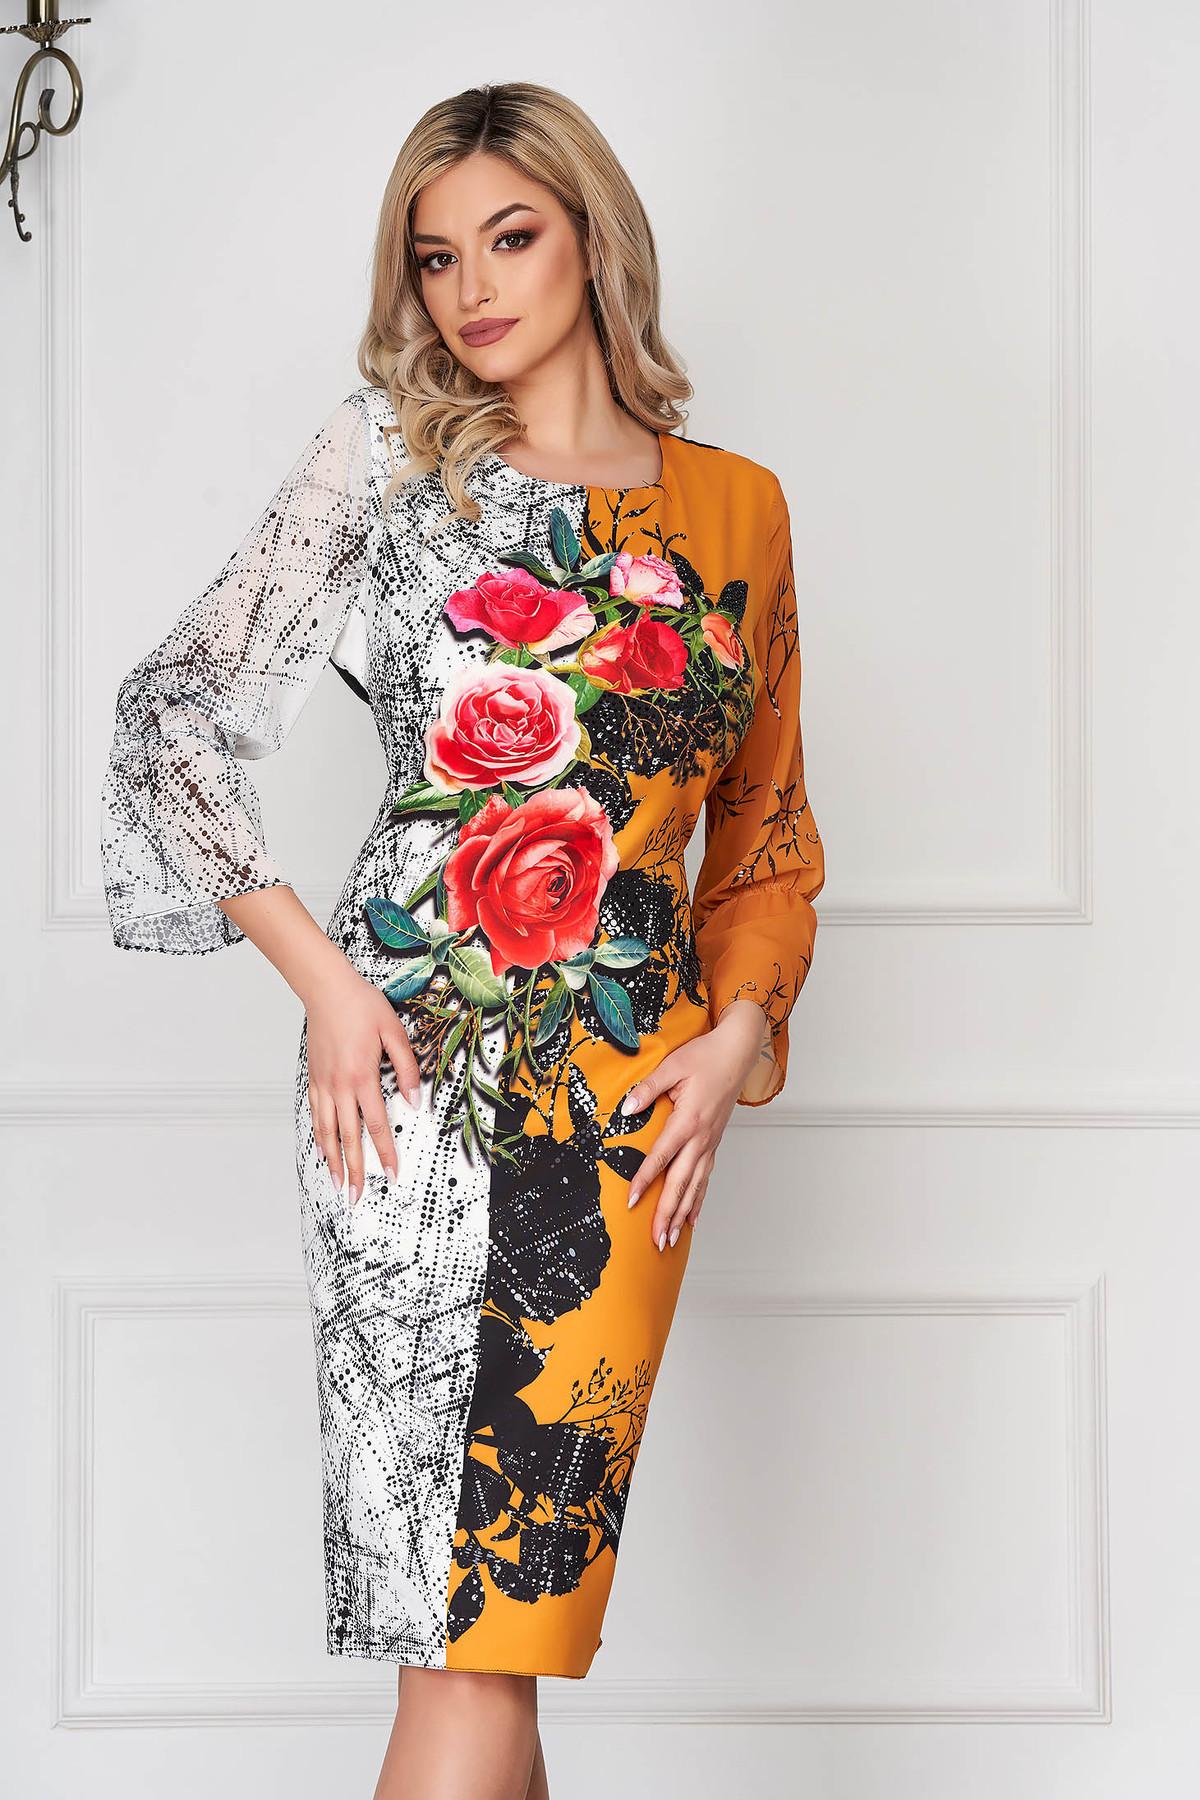 Rochie mustarie eleganta midi tip creion din stofa material subtire cu imprimeu floral